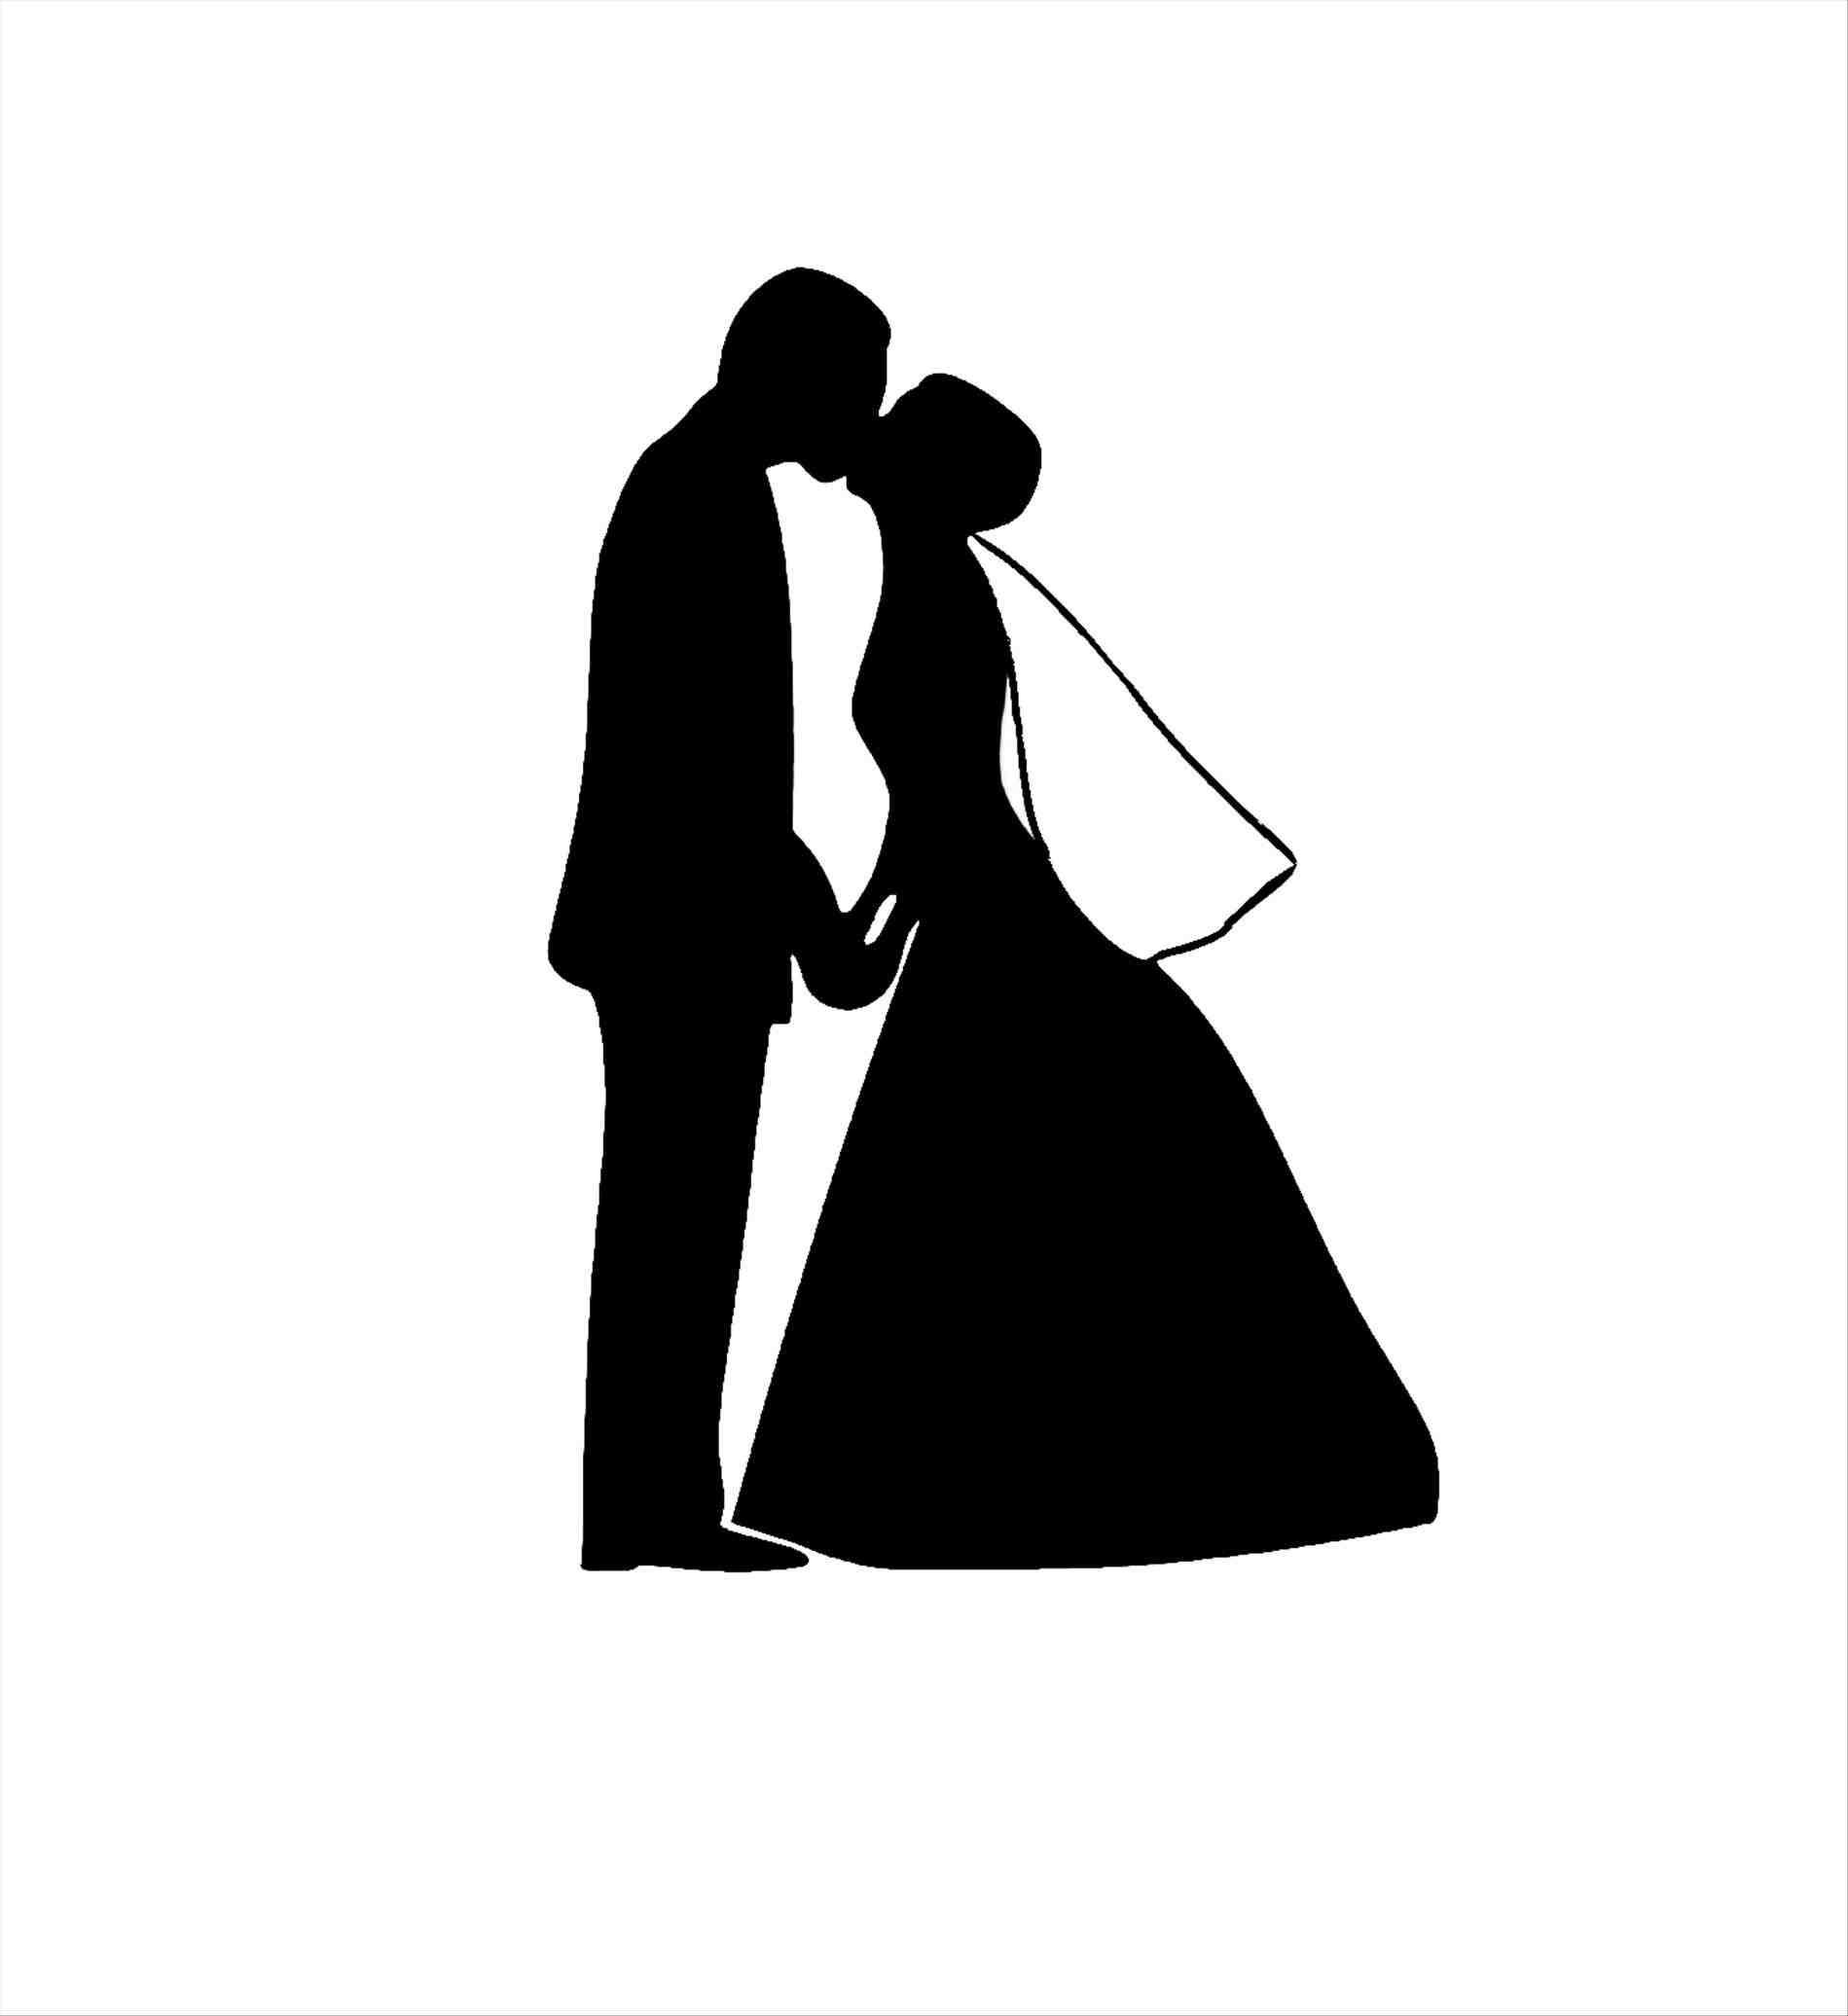 hight resolution of 1899x2072 vintage download art vintage wedding design clipart png free